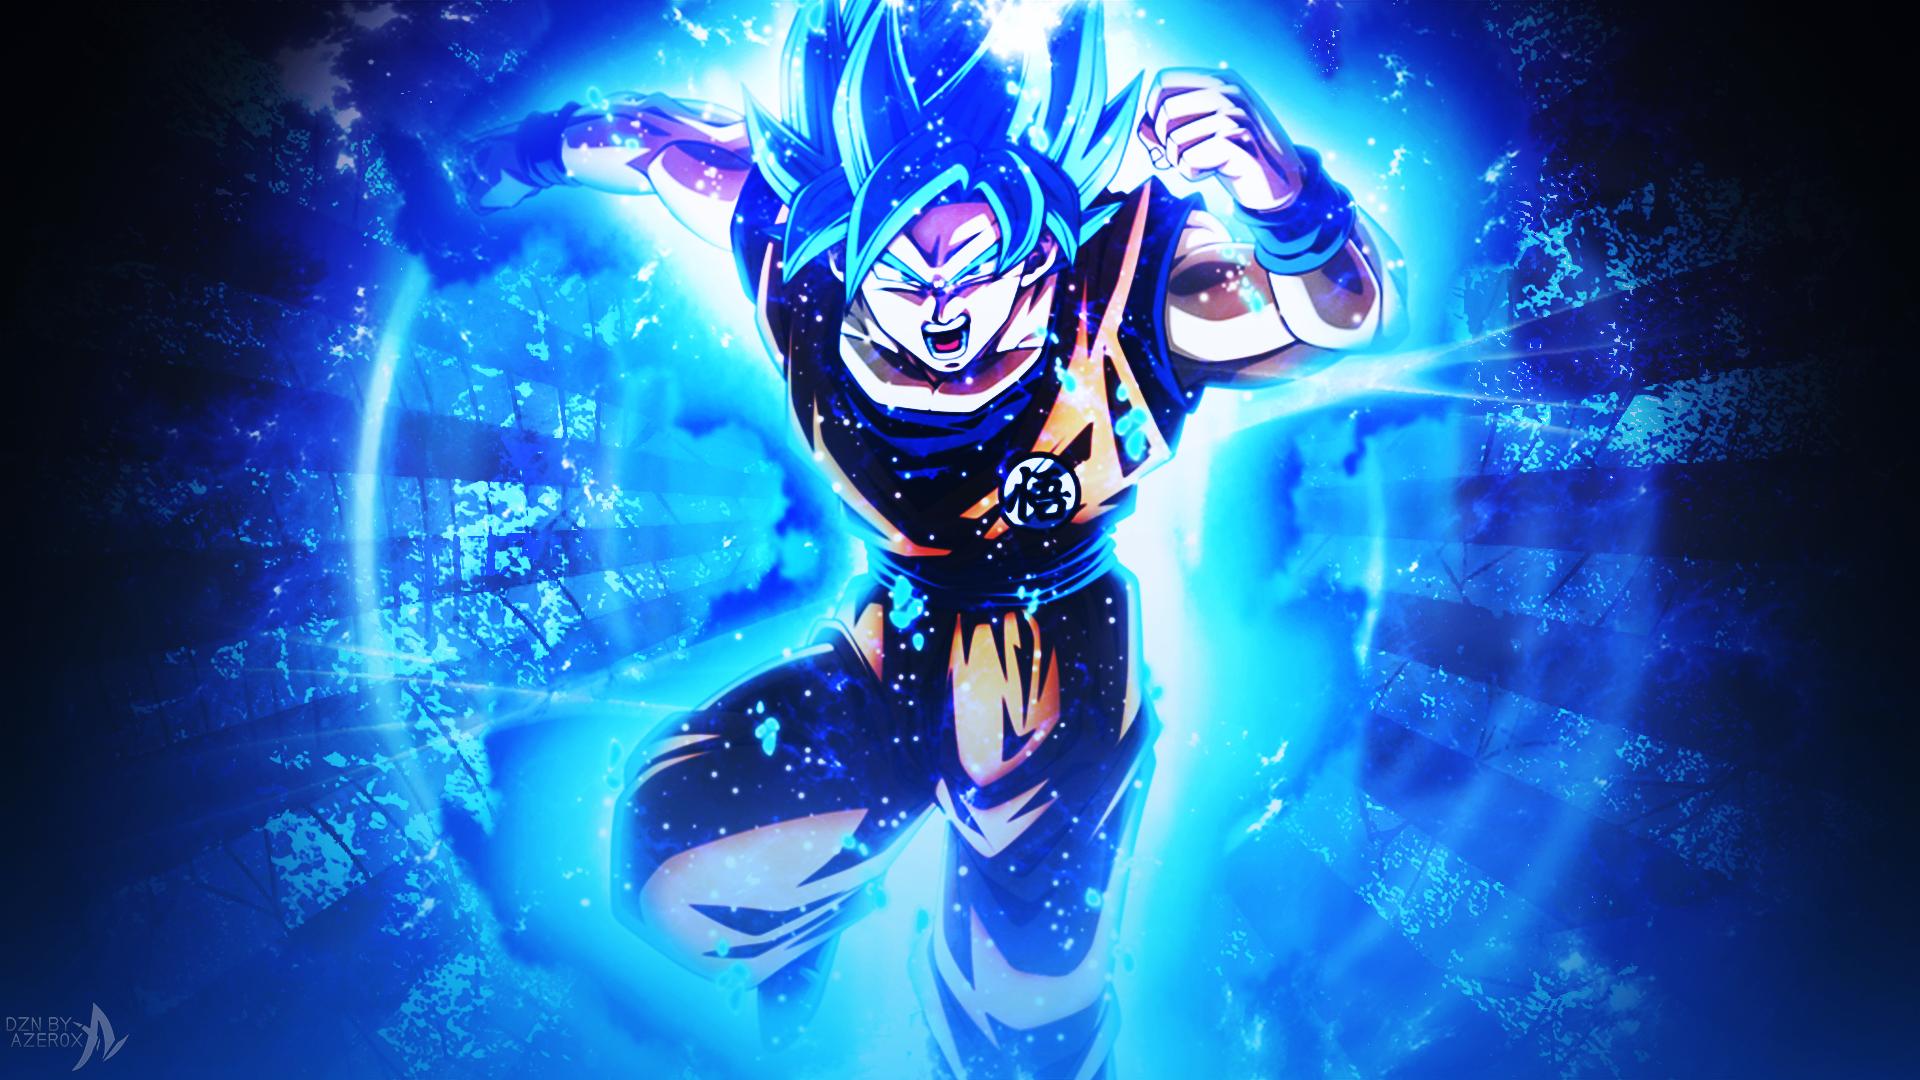 Anime 4k Wallpaper: GOKU BLUE (DRAGON BALL SUPER) By Azer0xHD On DeviantArt